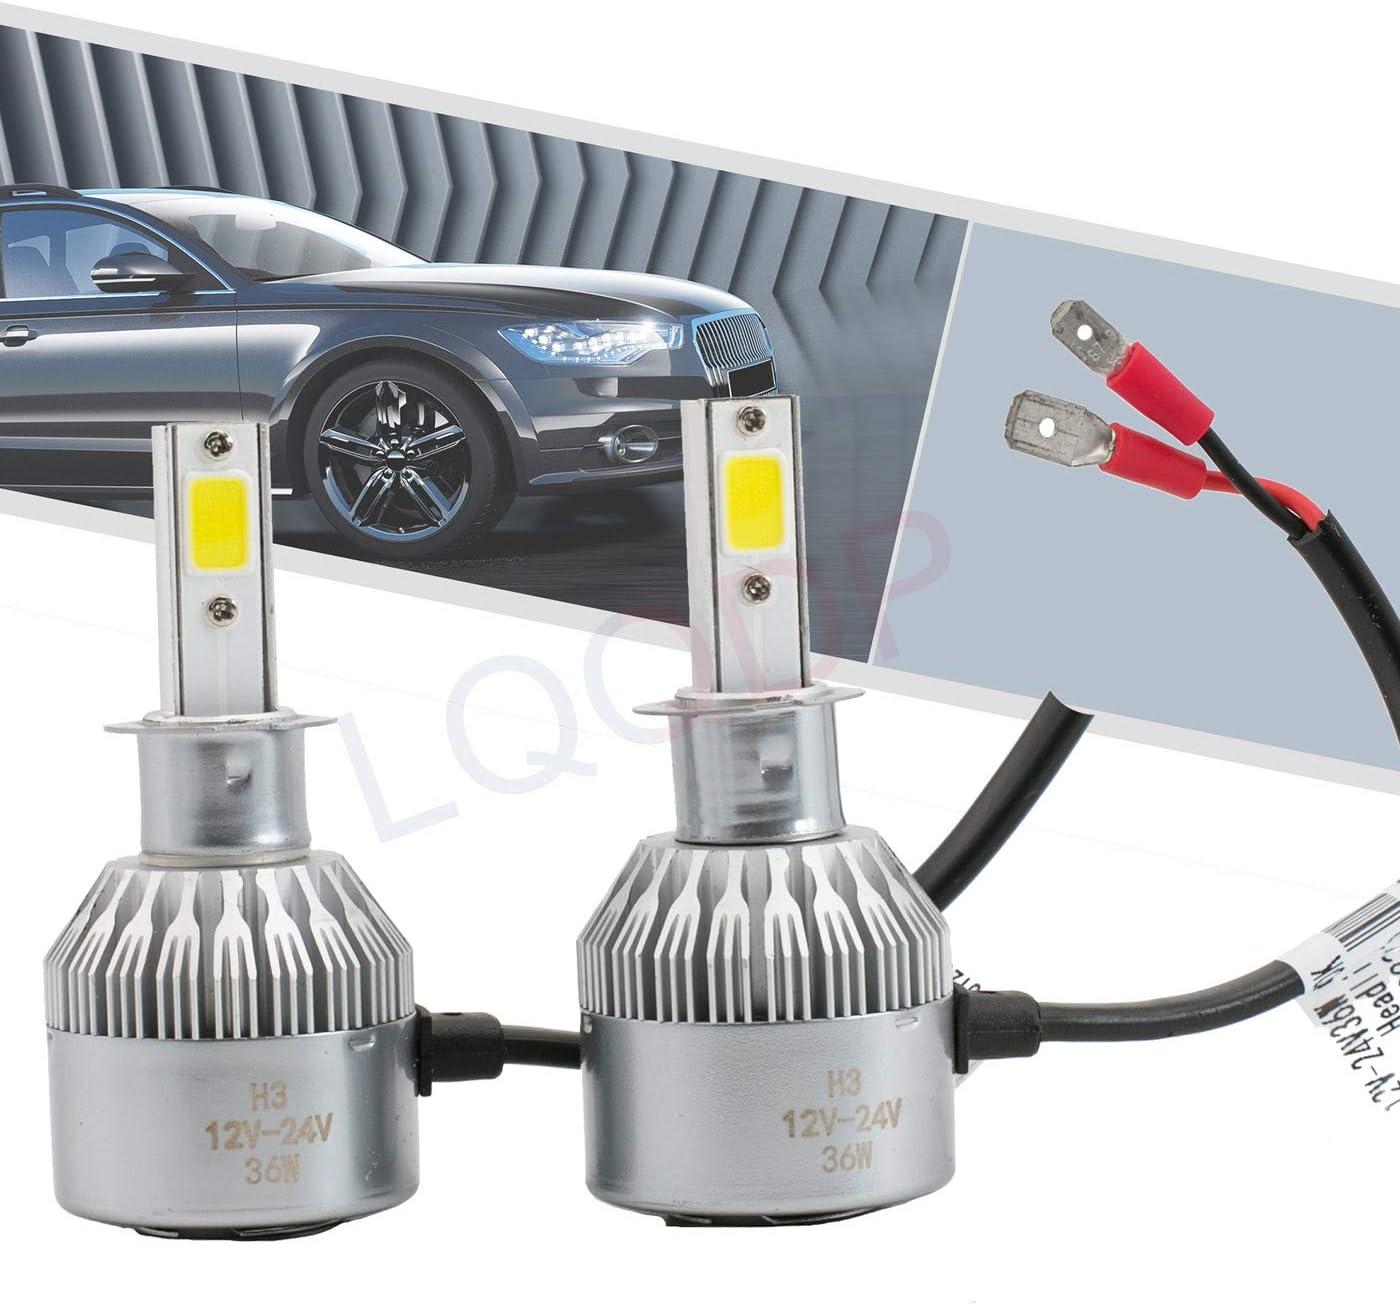 LQQDP 2pcs H3 6000K Soldering Cool White Super beauty product restock quality top Conversion Bulbs 7200LM COB K LED